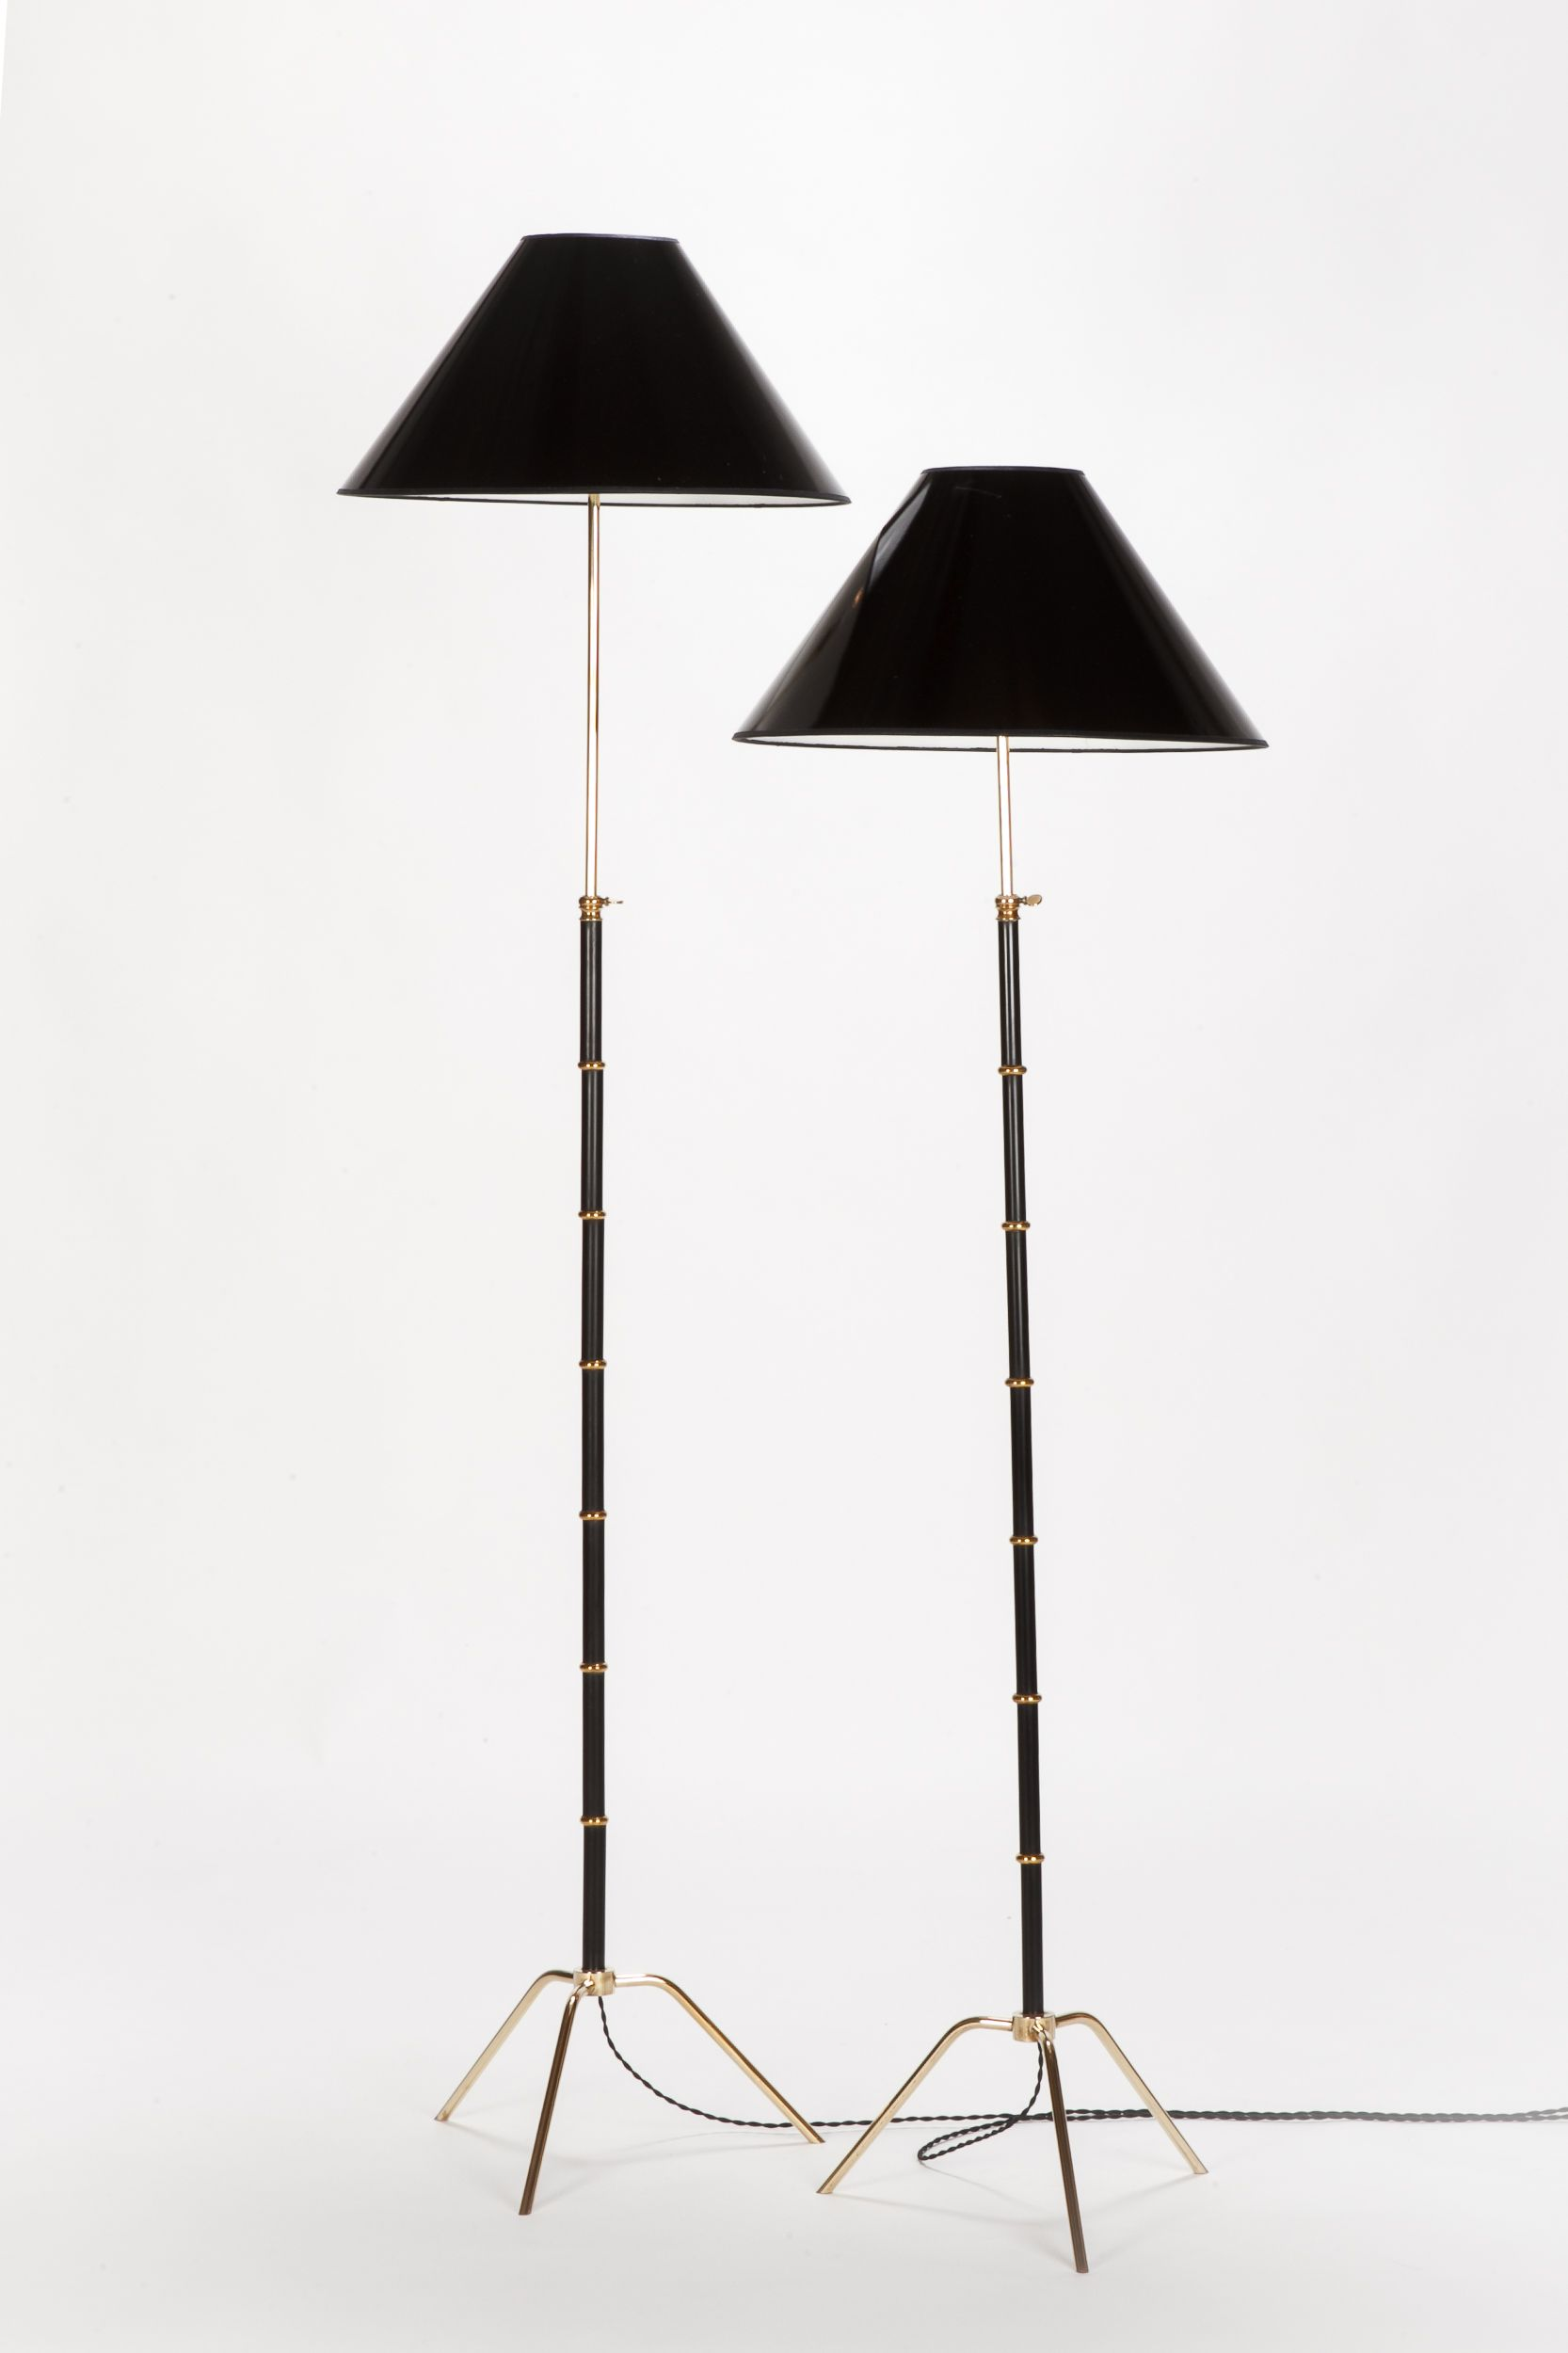 Paar Franzosische Stehlampen Maison Lunel 50er Okay Art Stehlampe Lampe Lampenschirm